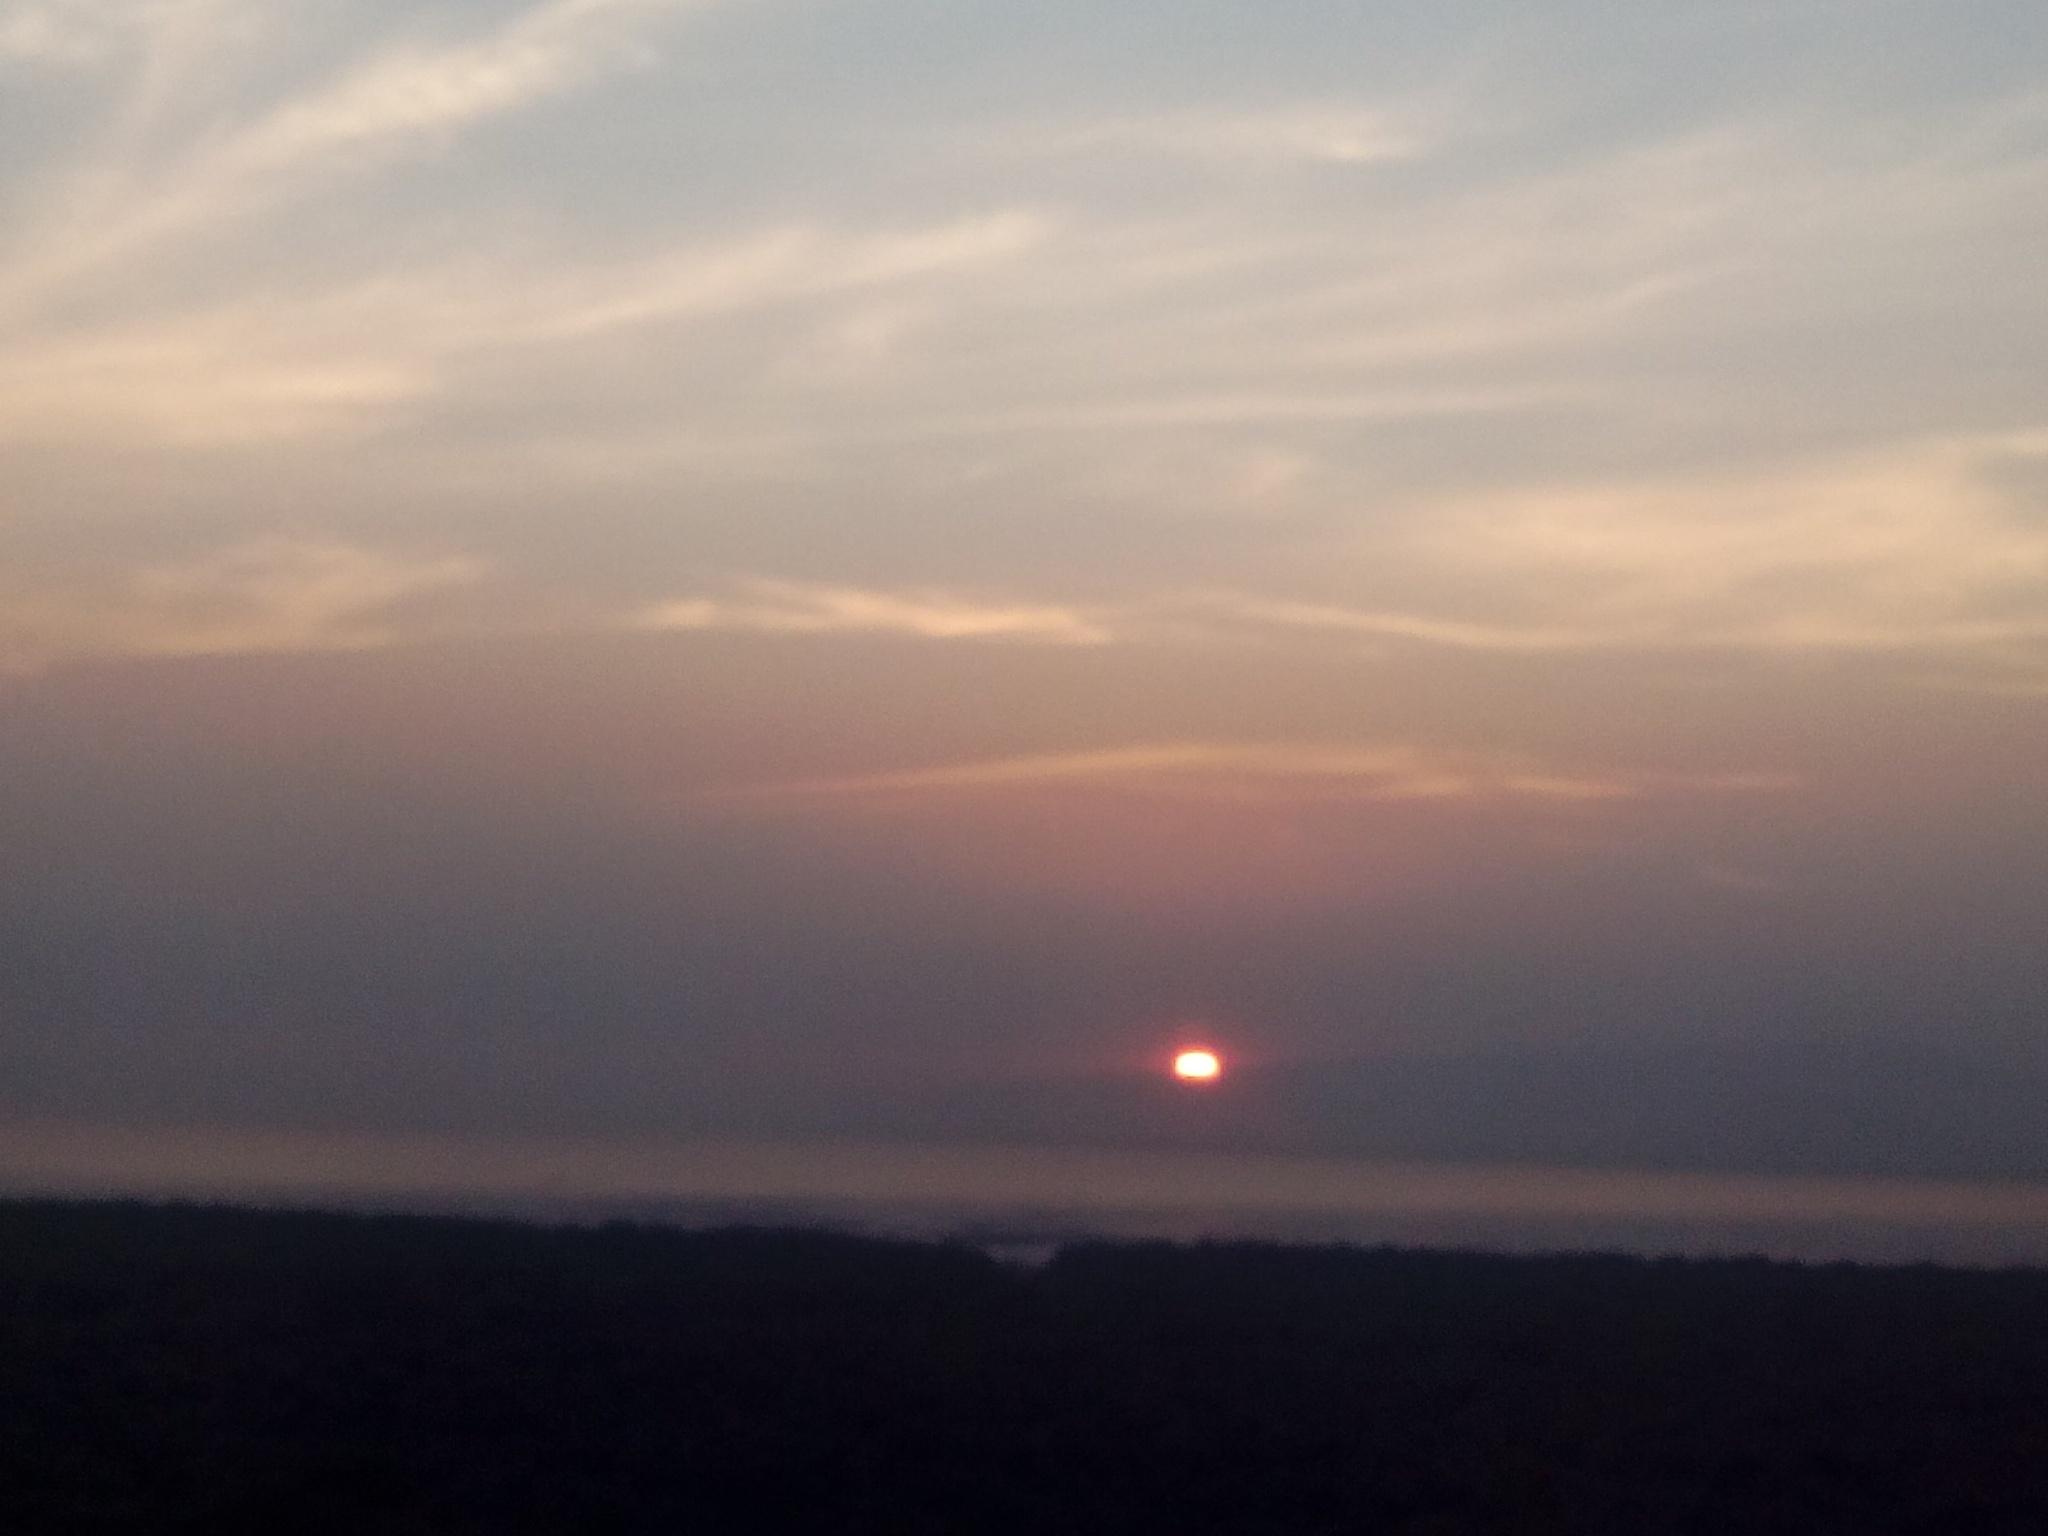 sunset by hchitnis